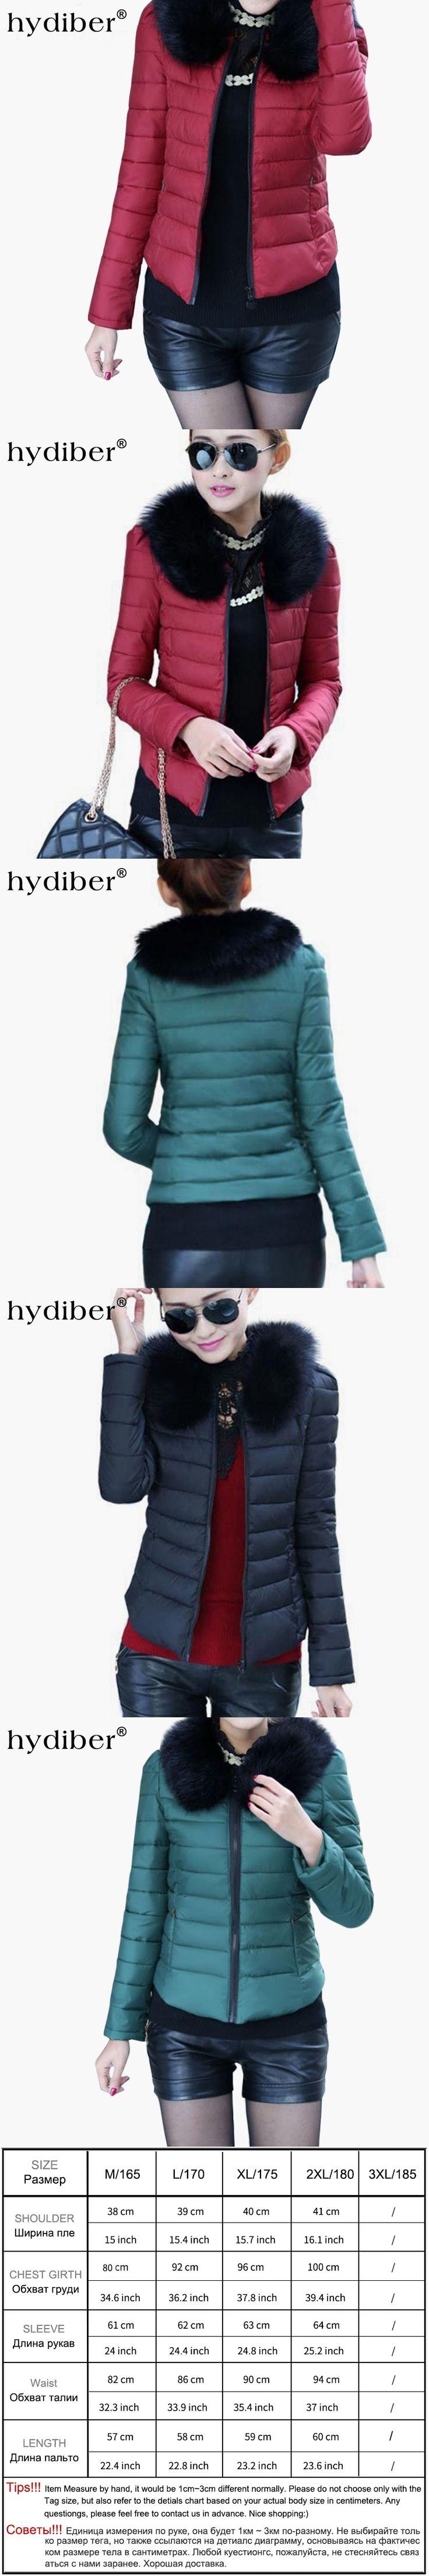 2015 Warm Winter Jacket Women Slim Detachable Fur Collar Coat Ladies Parka Outwear Casual Overcoat Z41